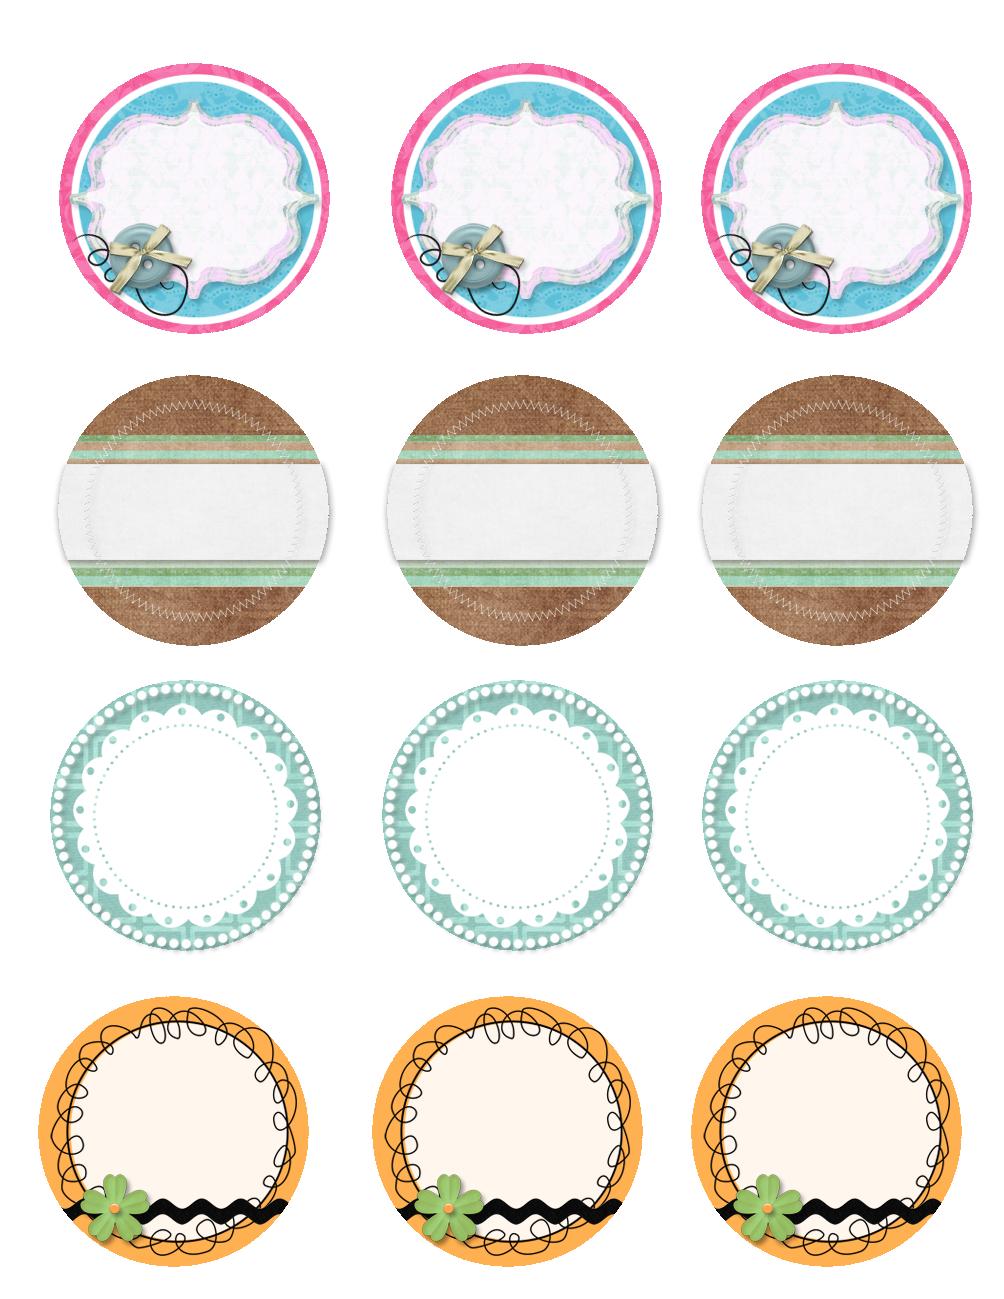 56 Cute Mason Jar Labels   Kittybabylove - Free Printable Mason Jar Labels Template